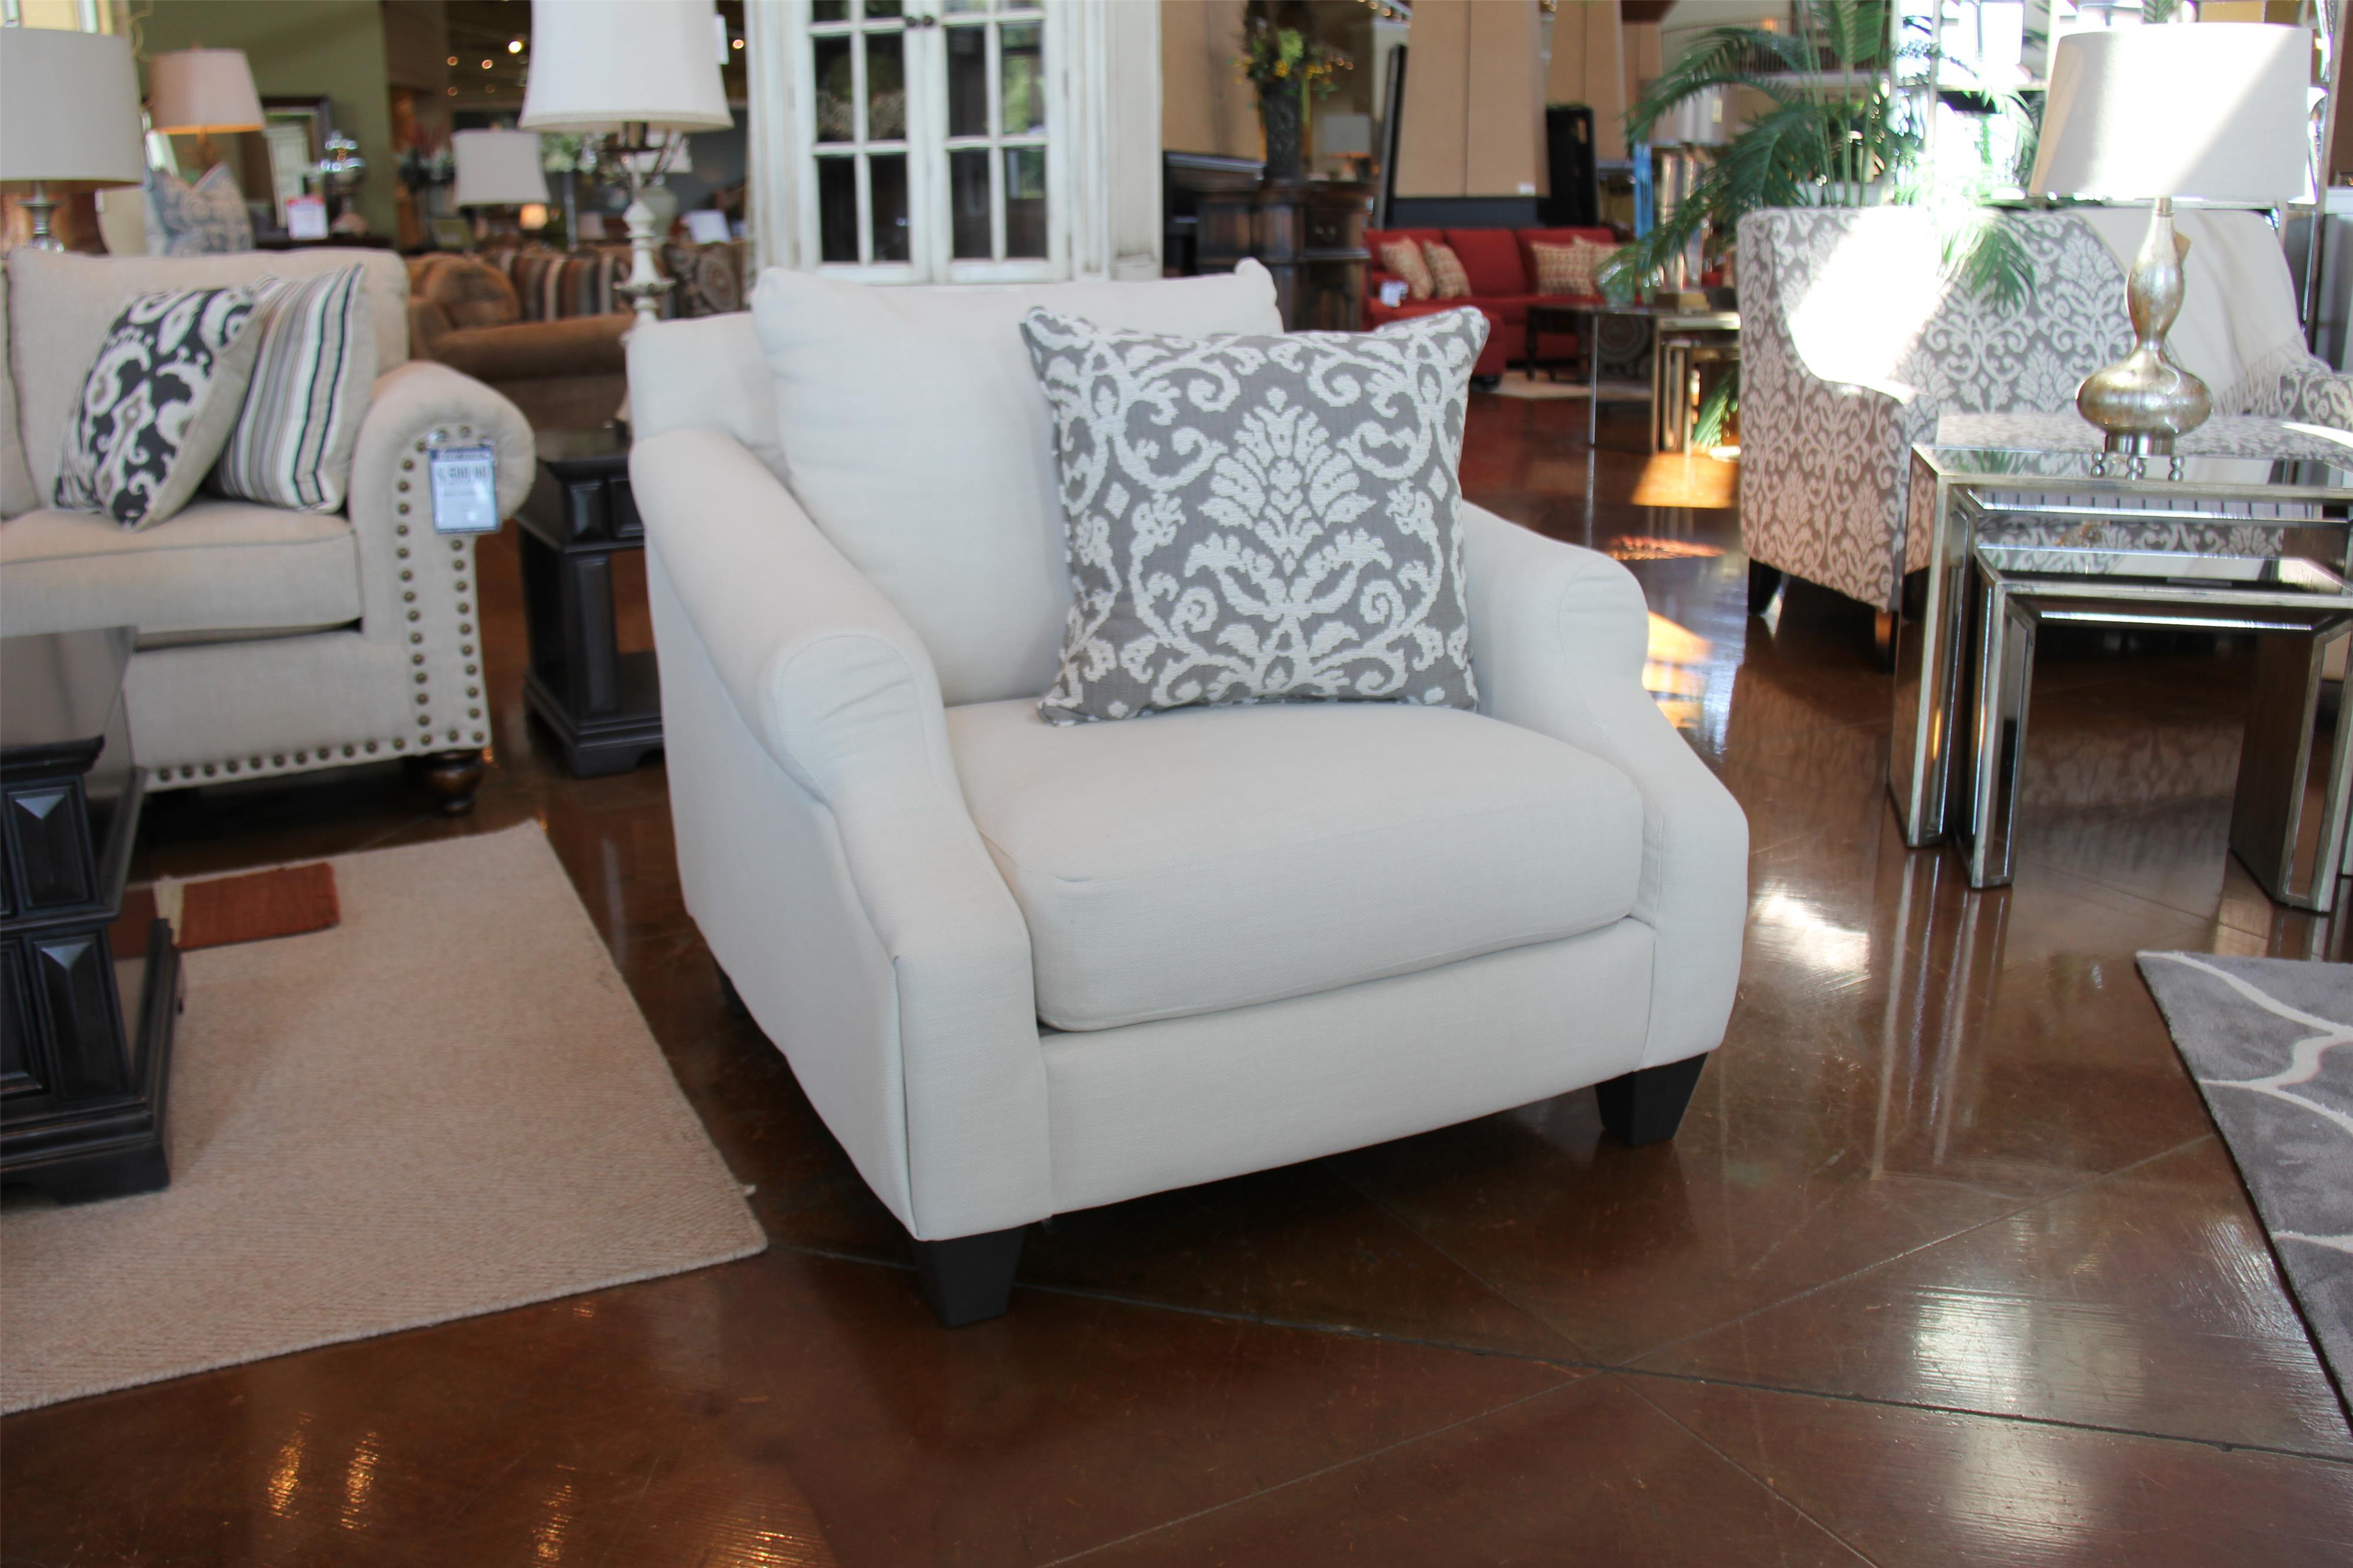 Corinthian 56A0 Lavish Cream Chair - Item Number: 56A1